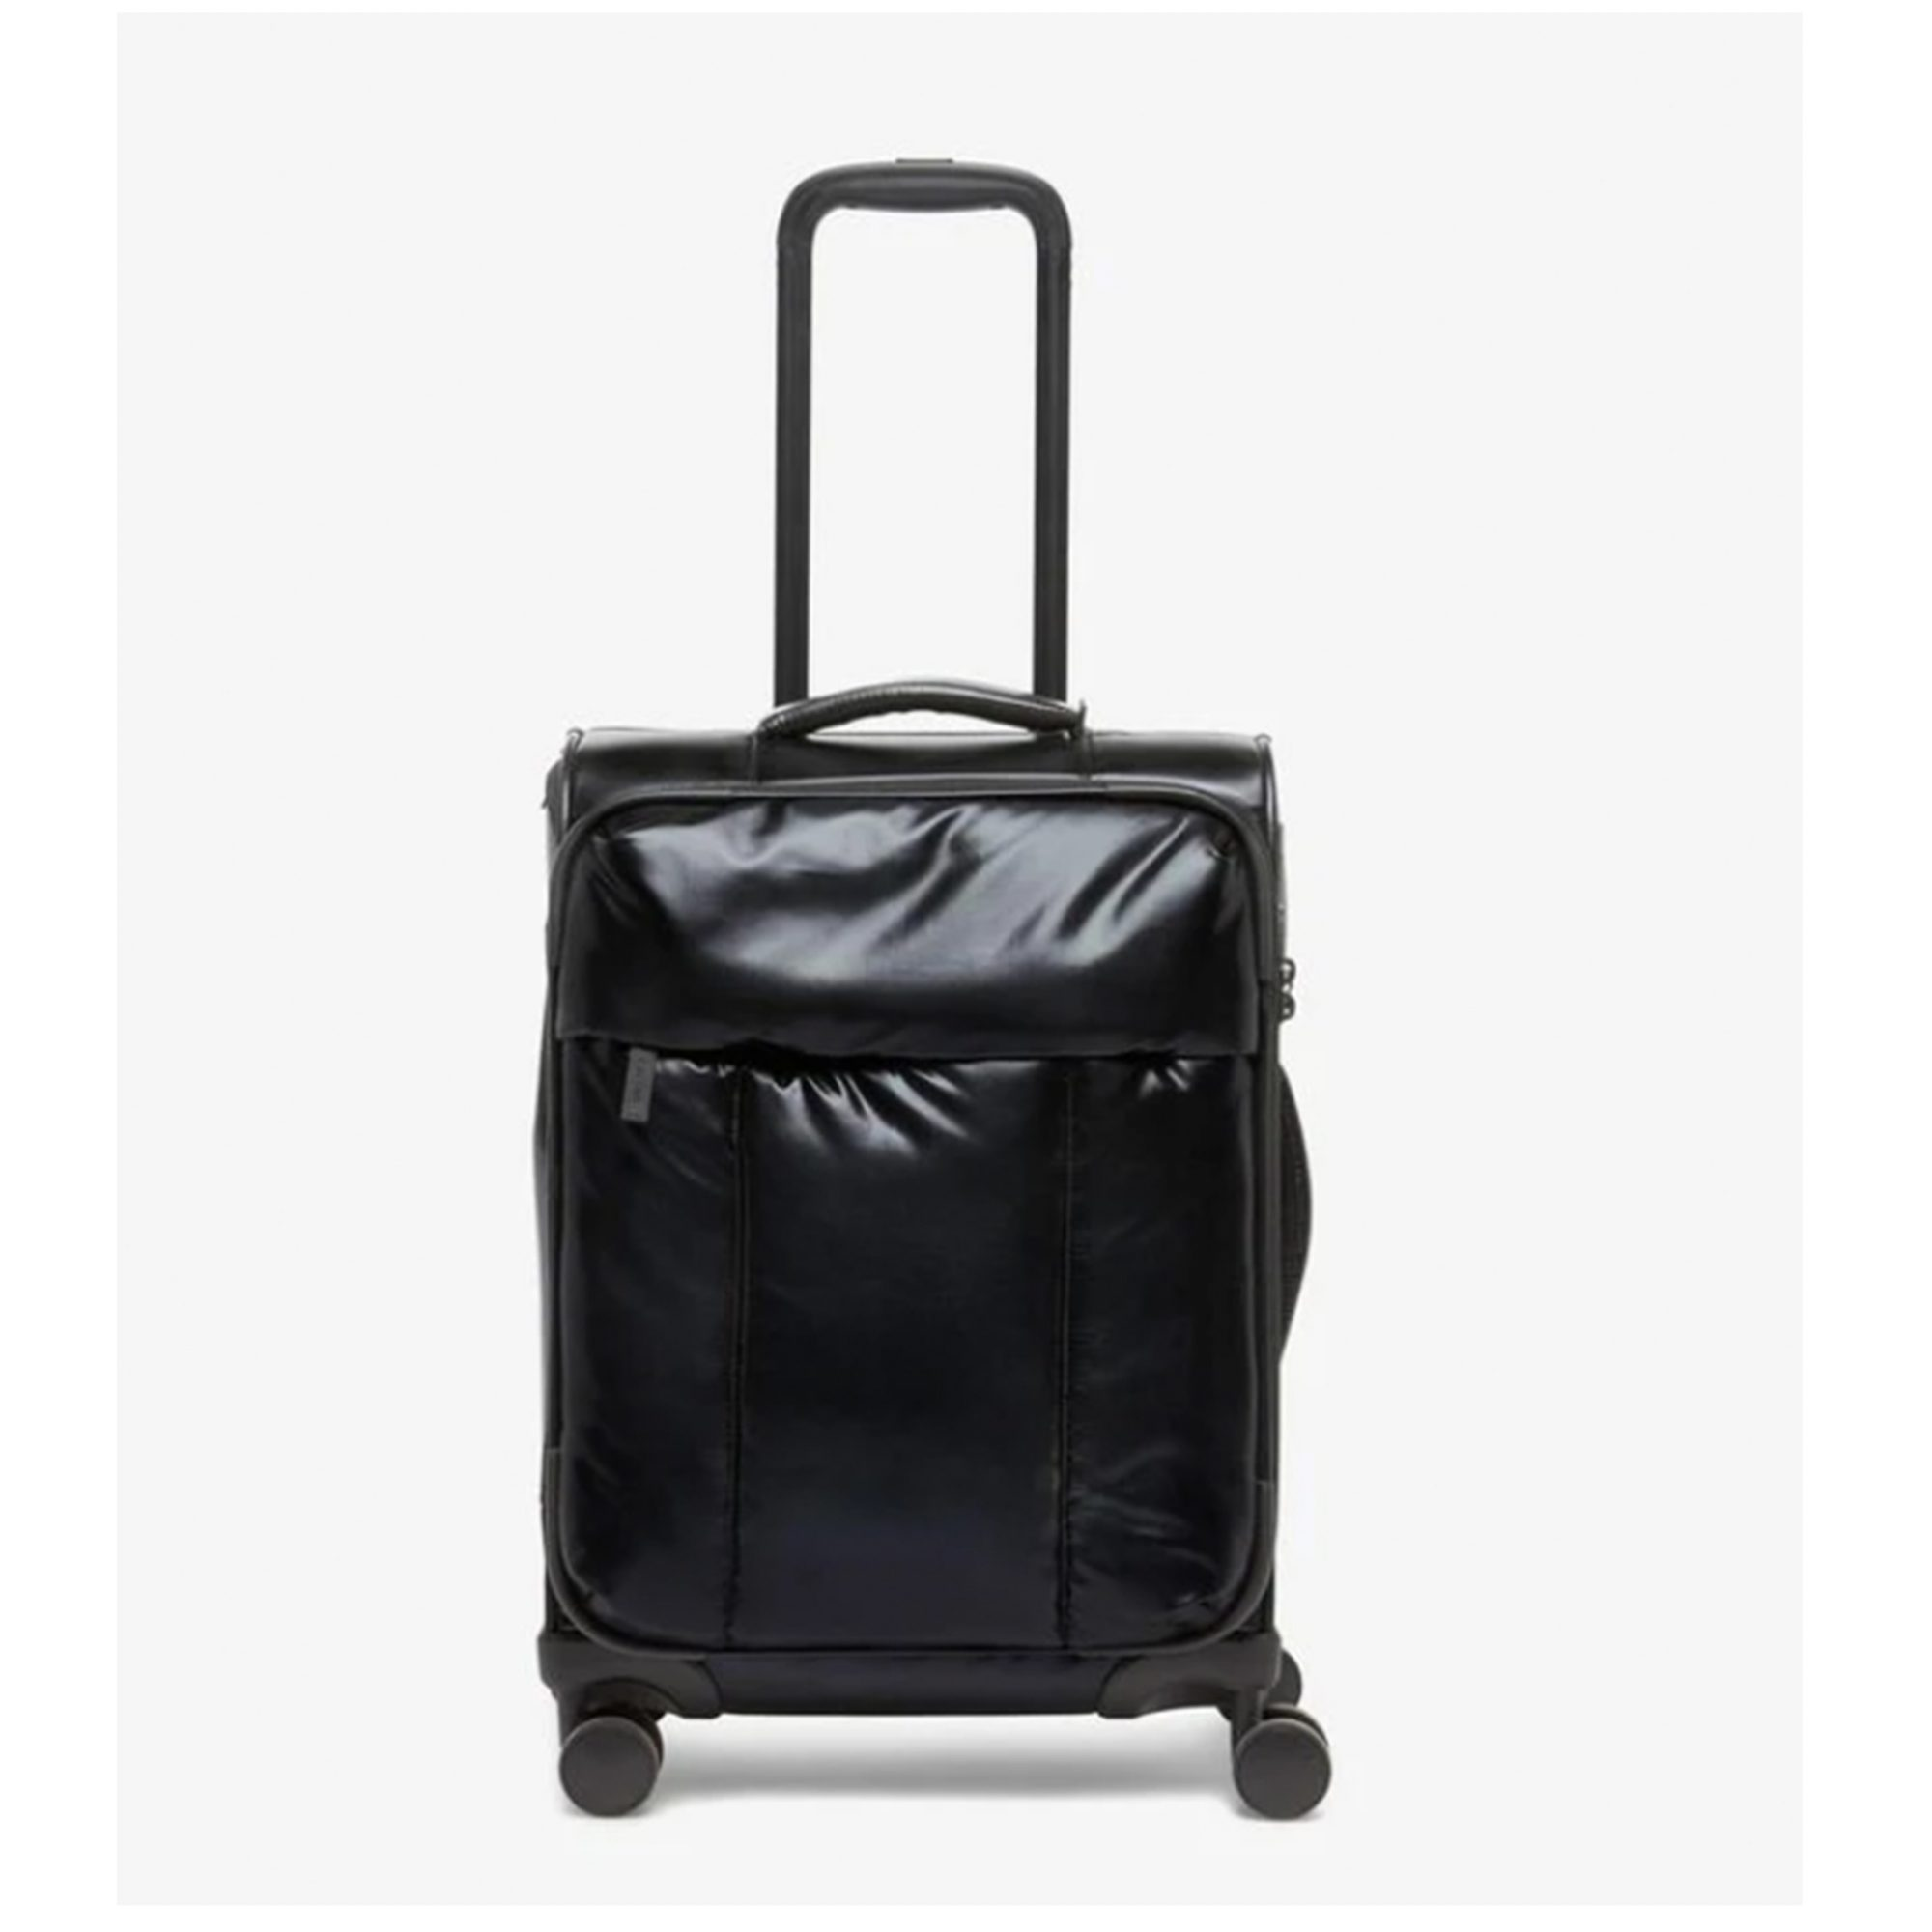 calpak-soft-luggage